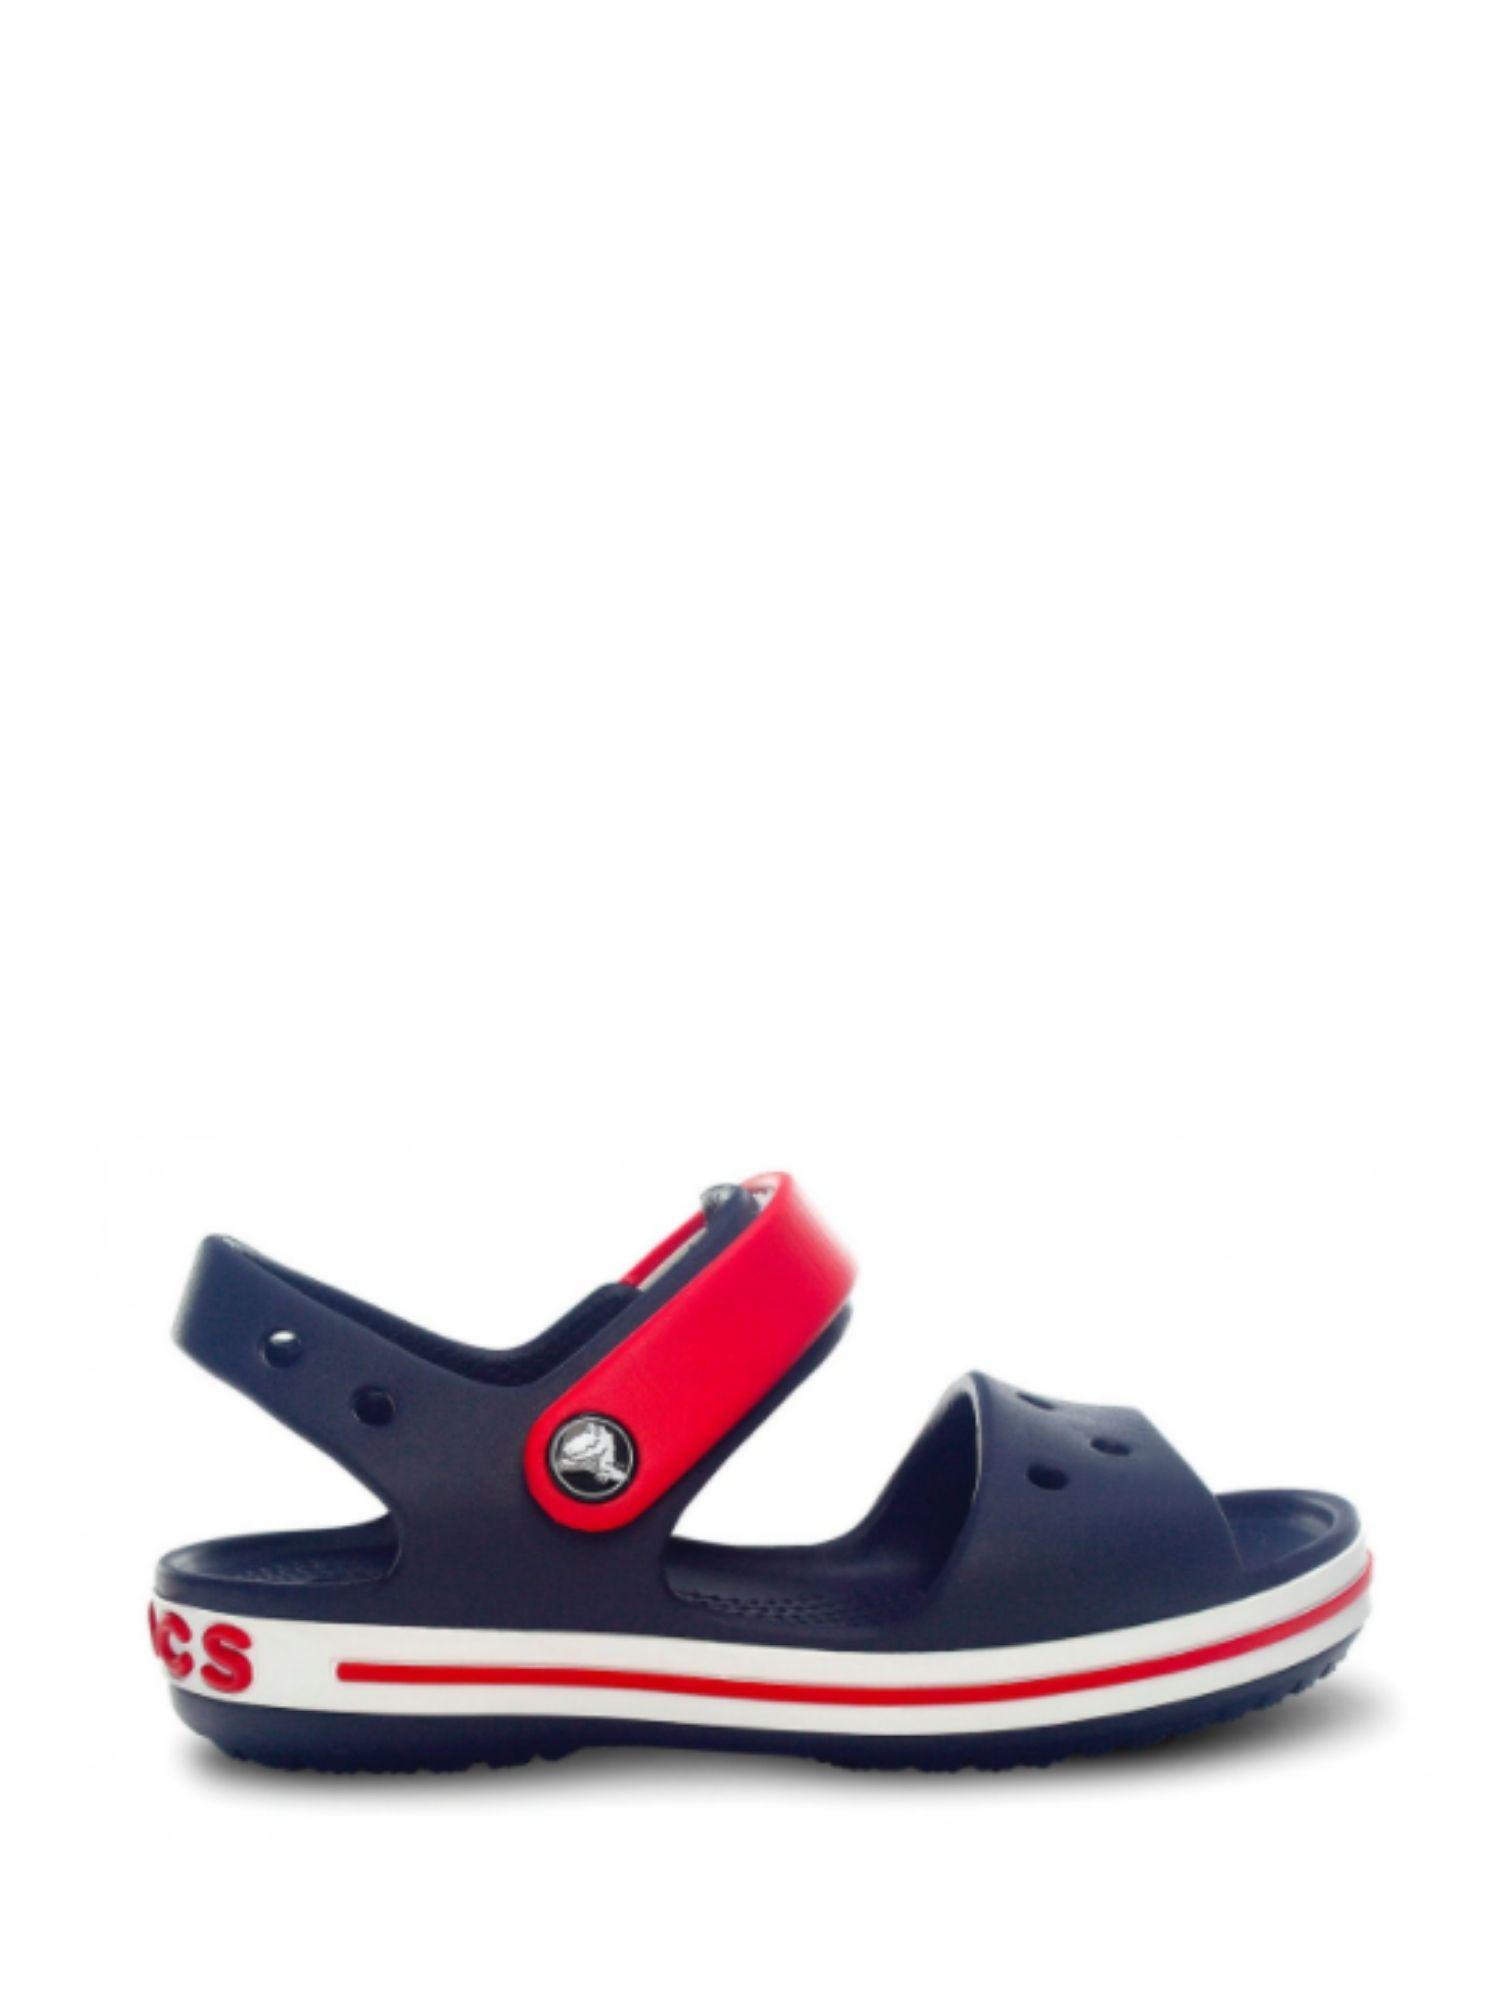 Sandalo Crocs bambino Crocband Sandalo K 12856 NavyRed